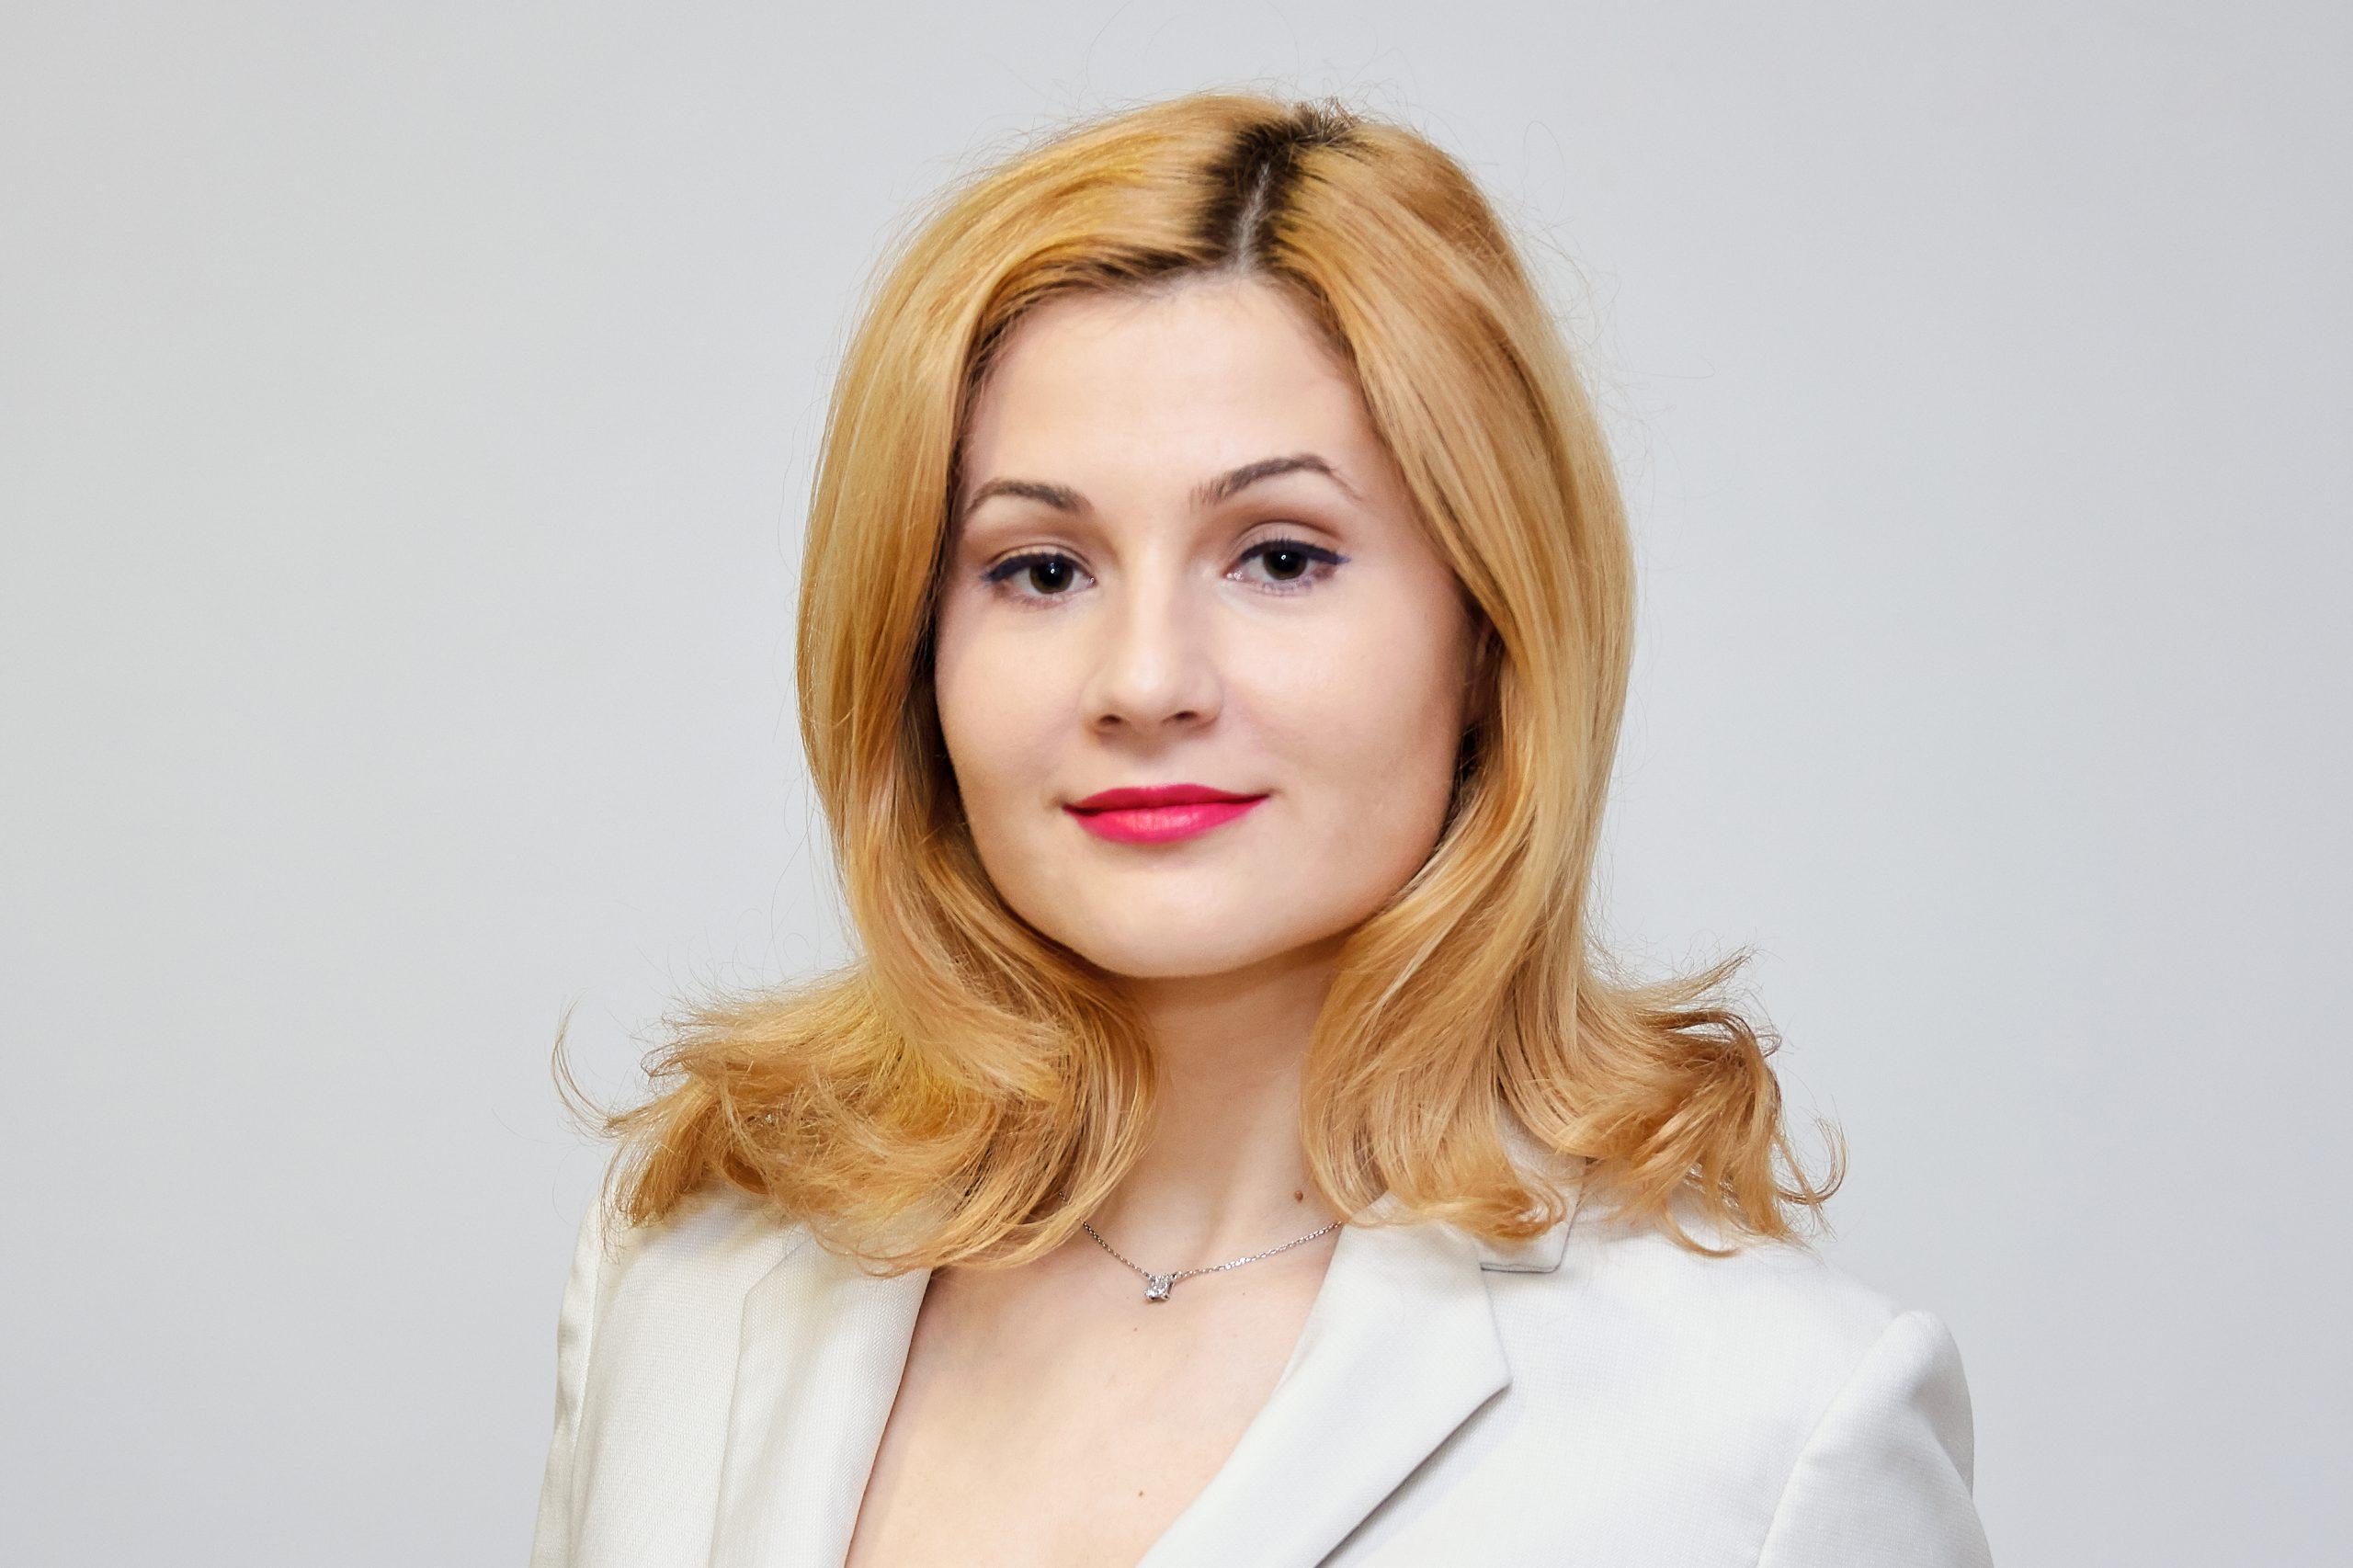 Anca-Maria Rotarescu